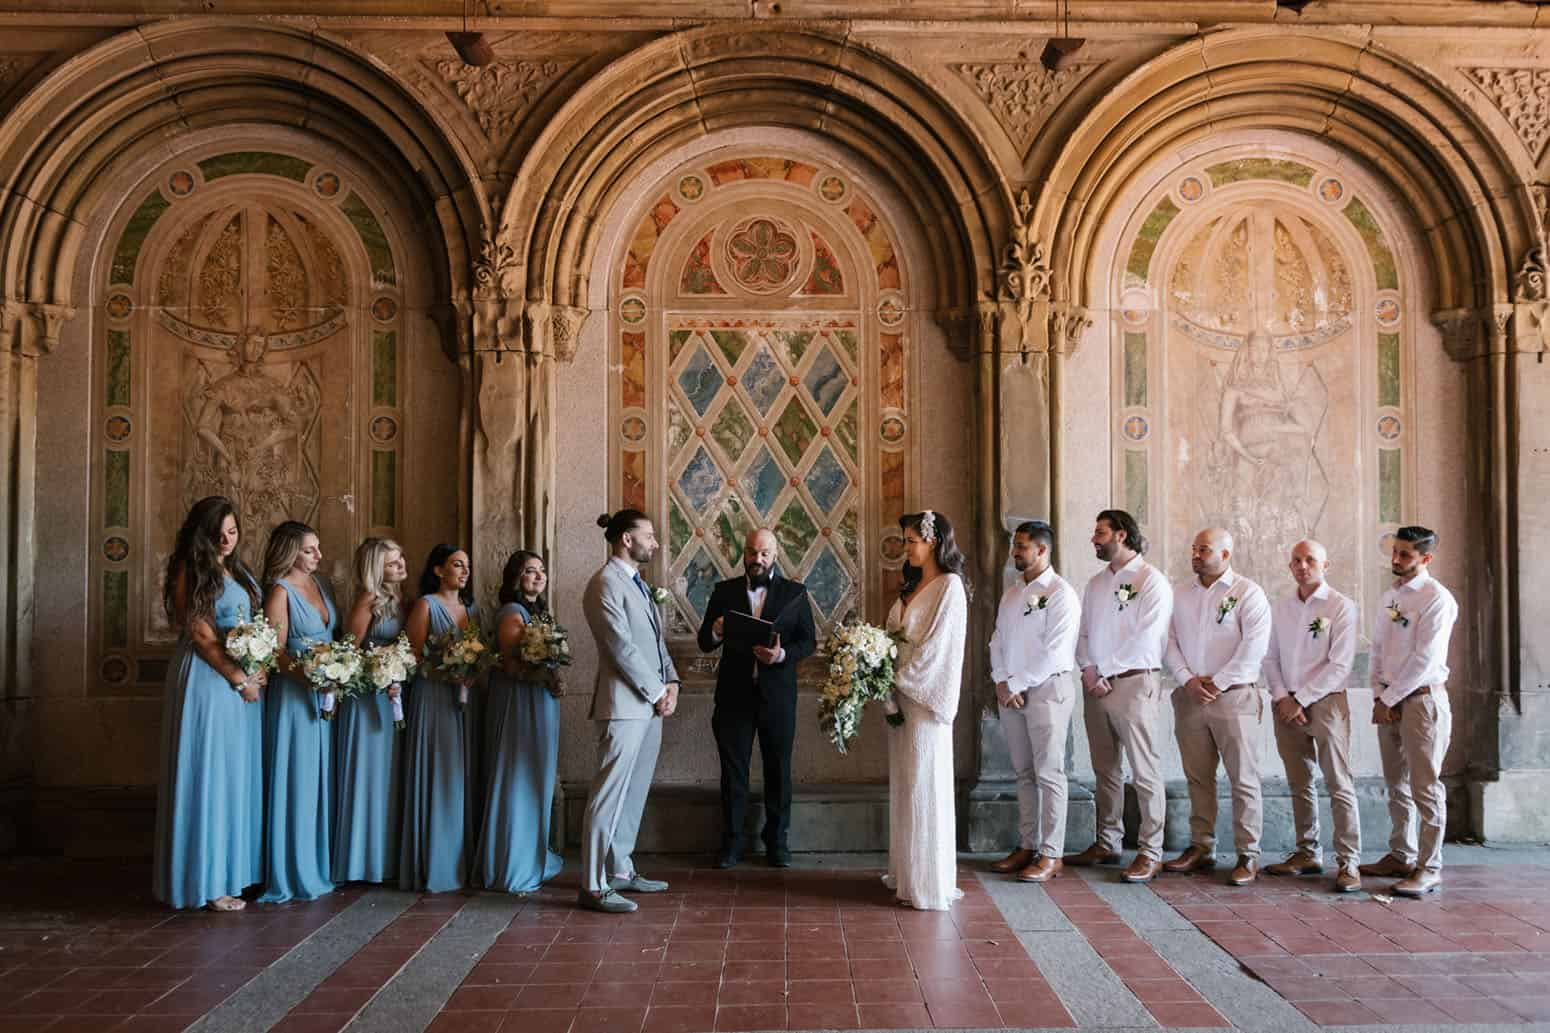 Bethesda Terrace wedding at Central Park NYC